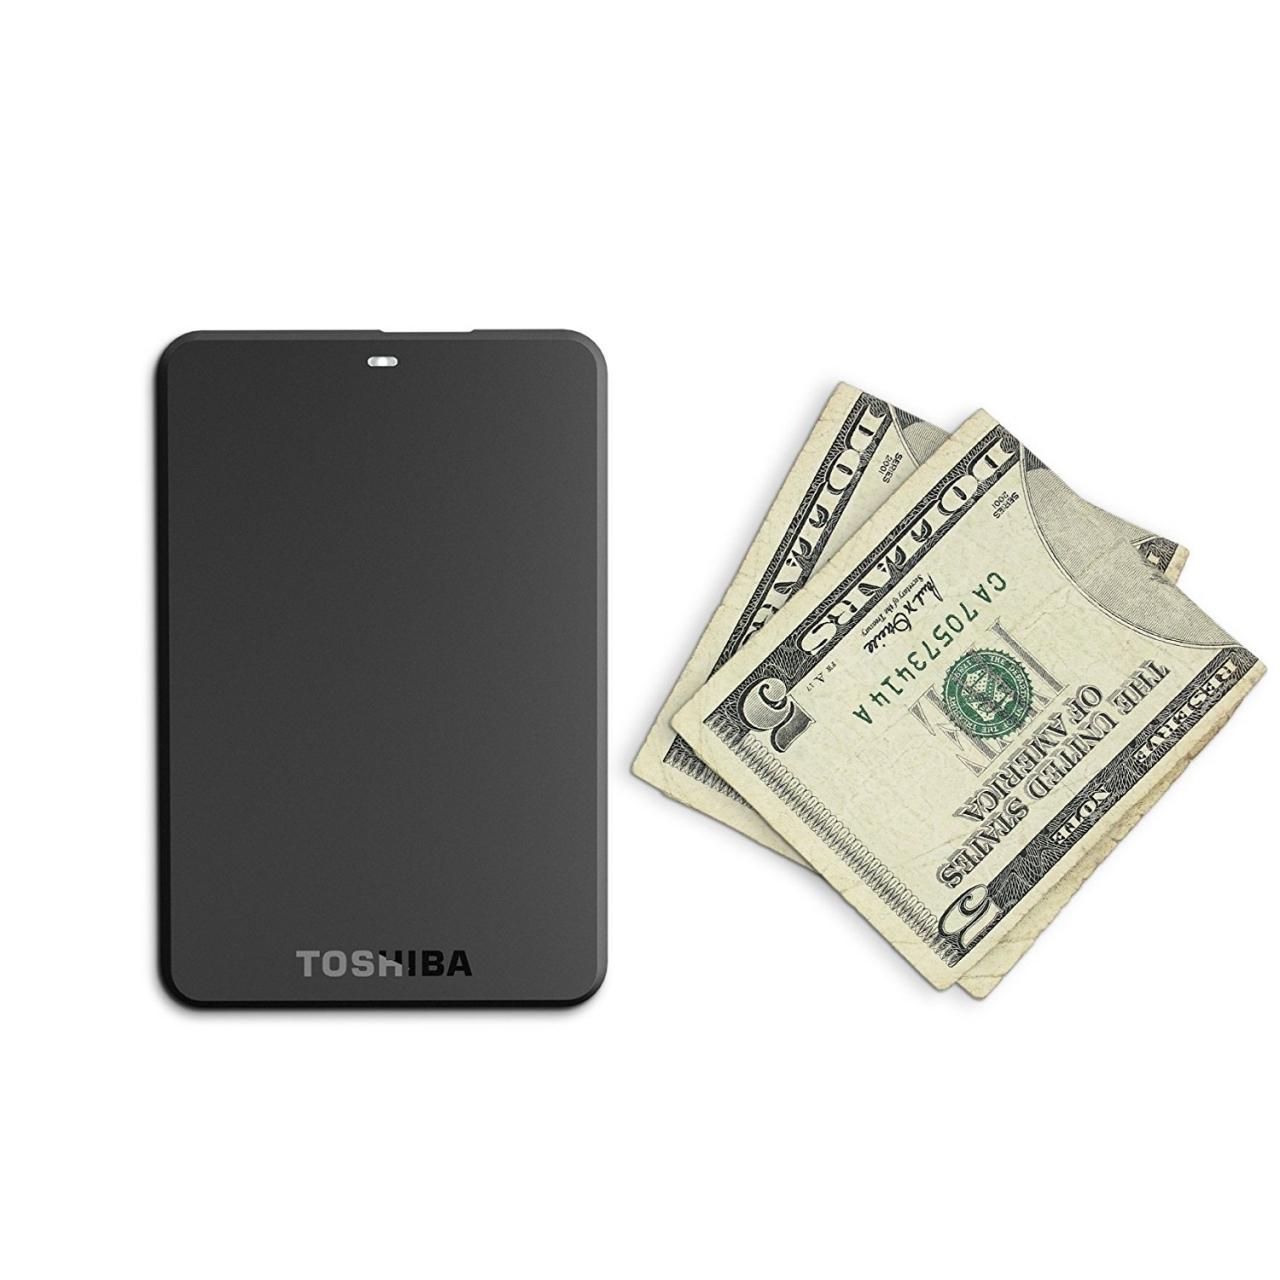 Kilimall Toshiba Canvio 1tb External Hard Disk Hdtb310ek3aa Black Hardisk Digital Kenya Ltd